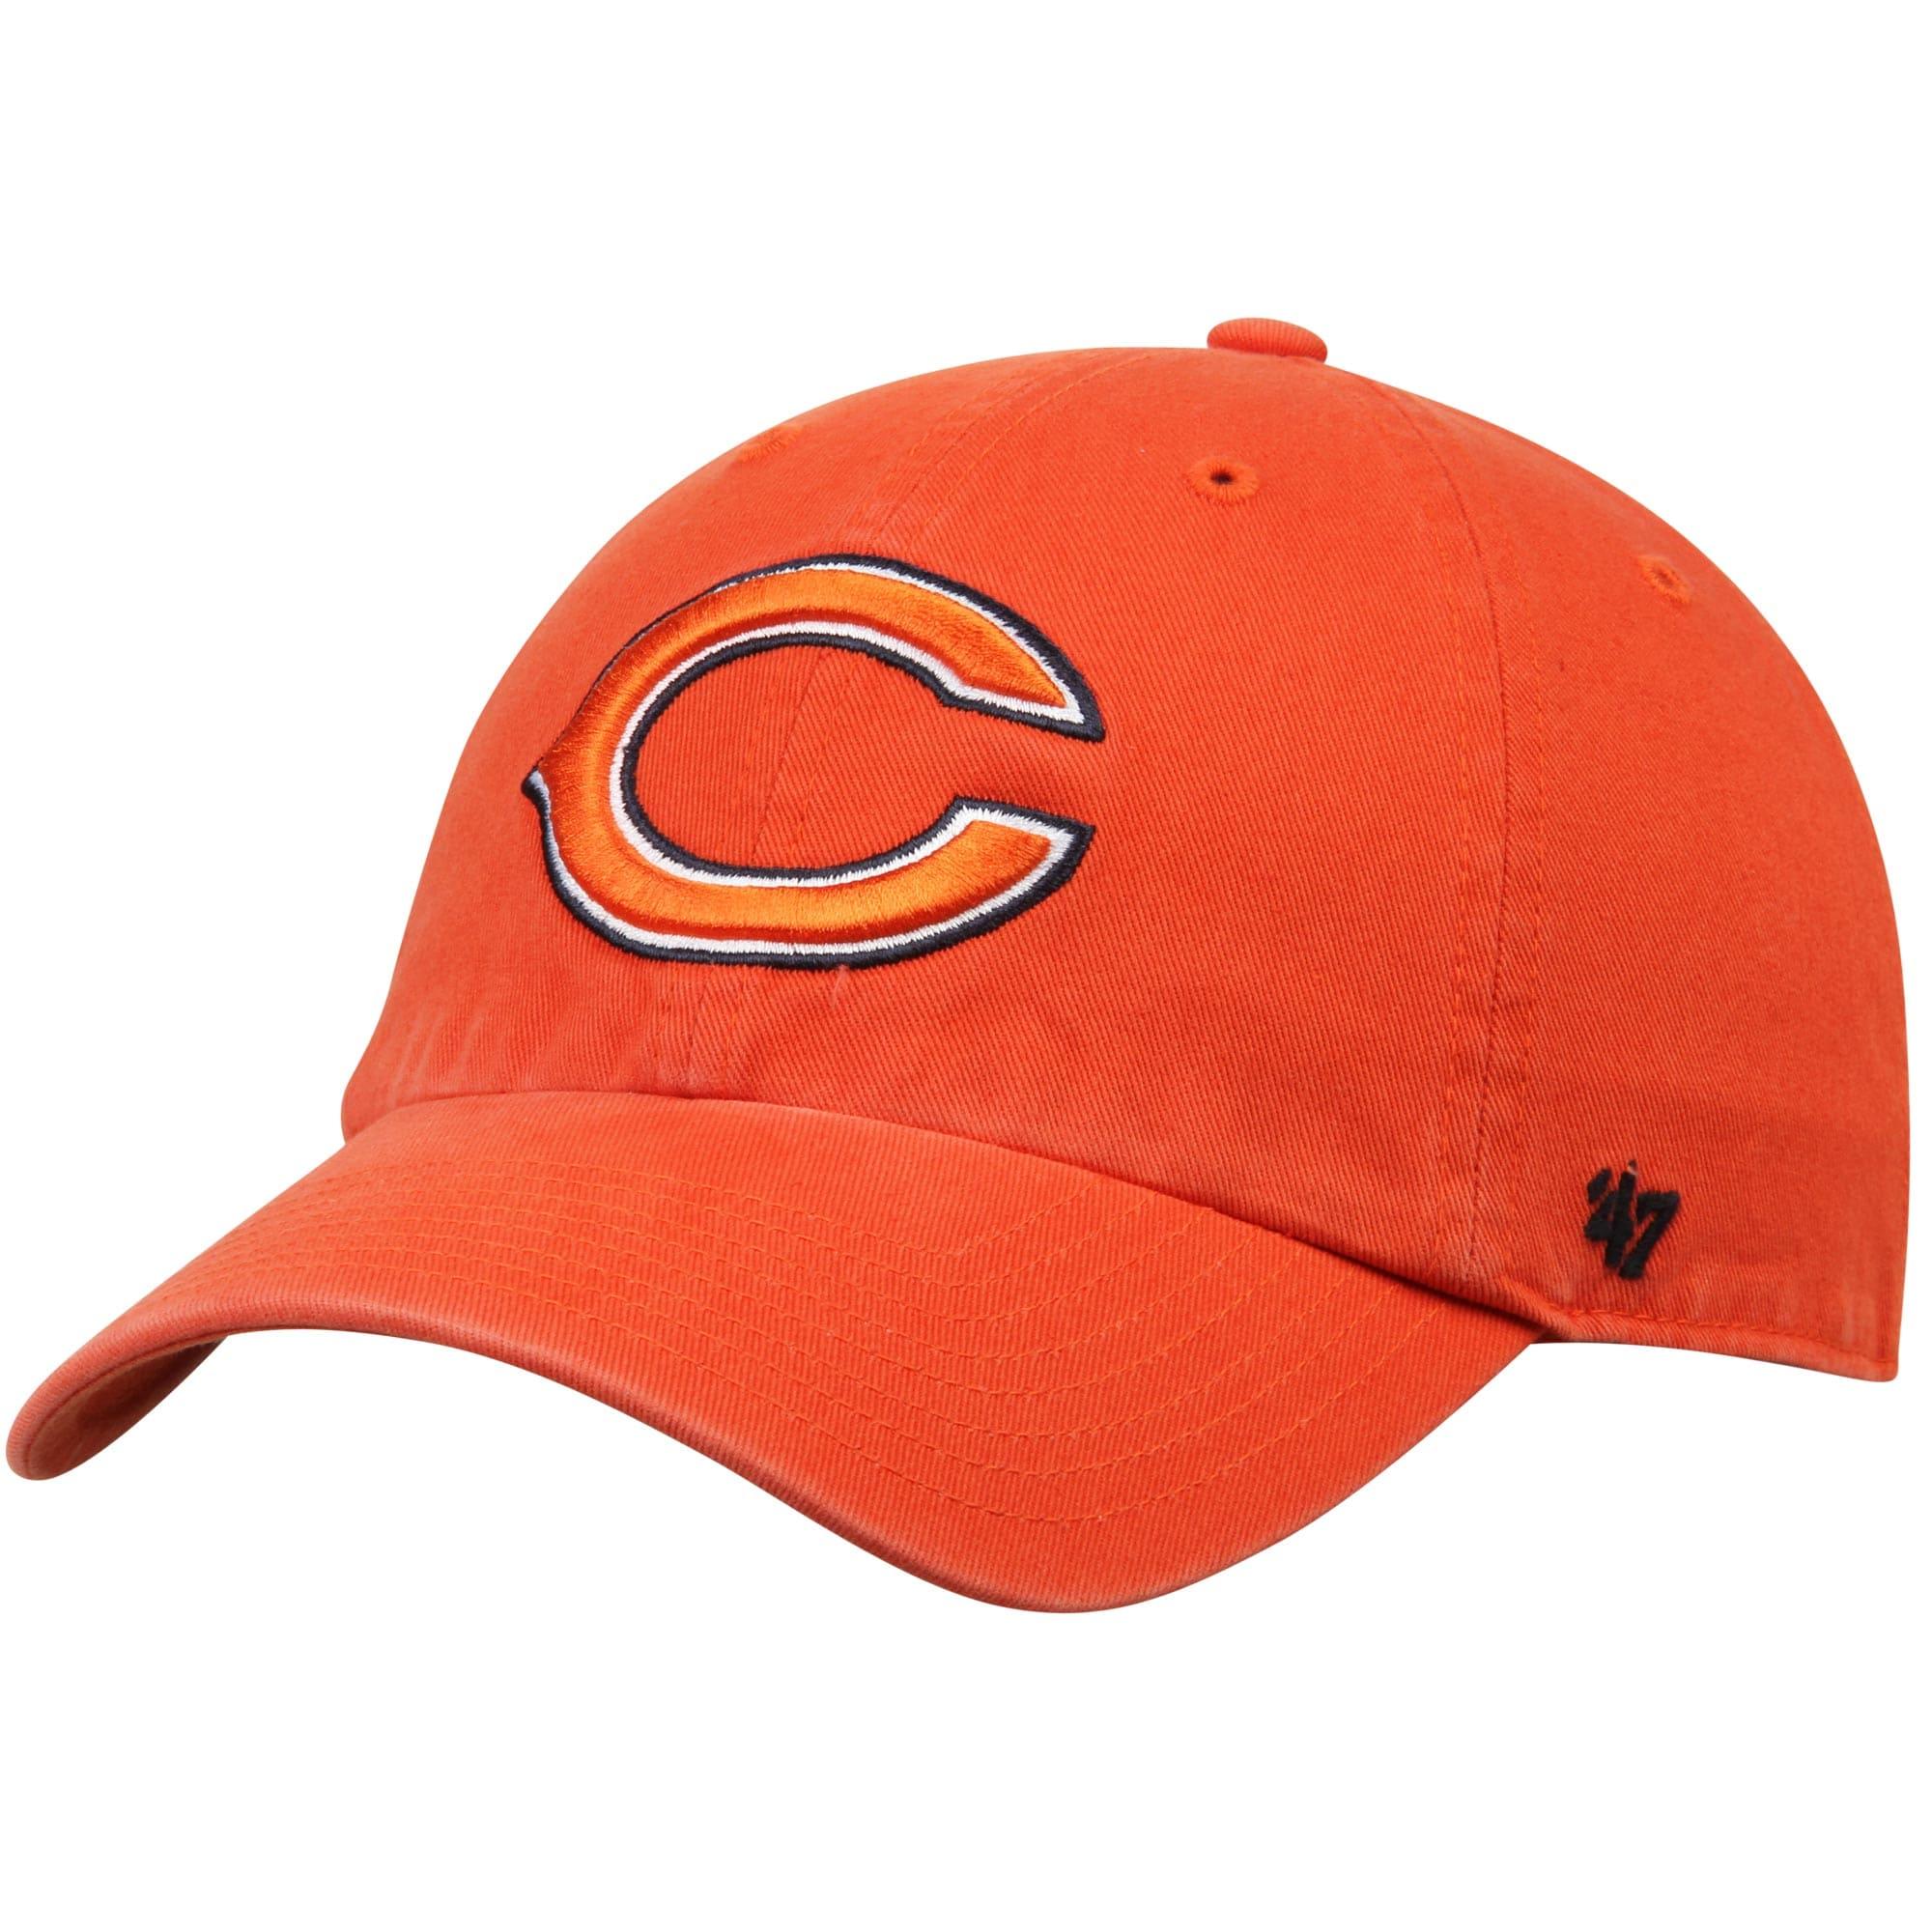 Chicago Bears '47 Clean Up Adjustable Hat - Orange